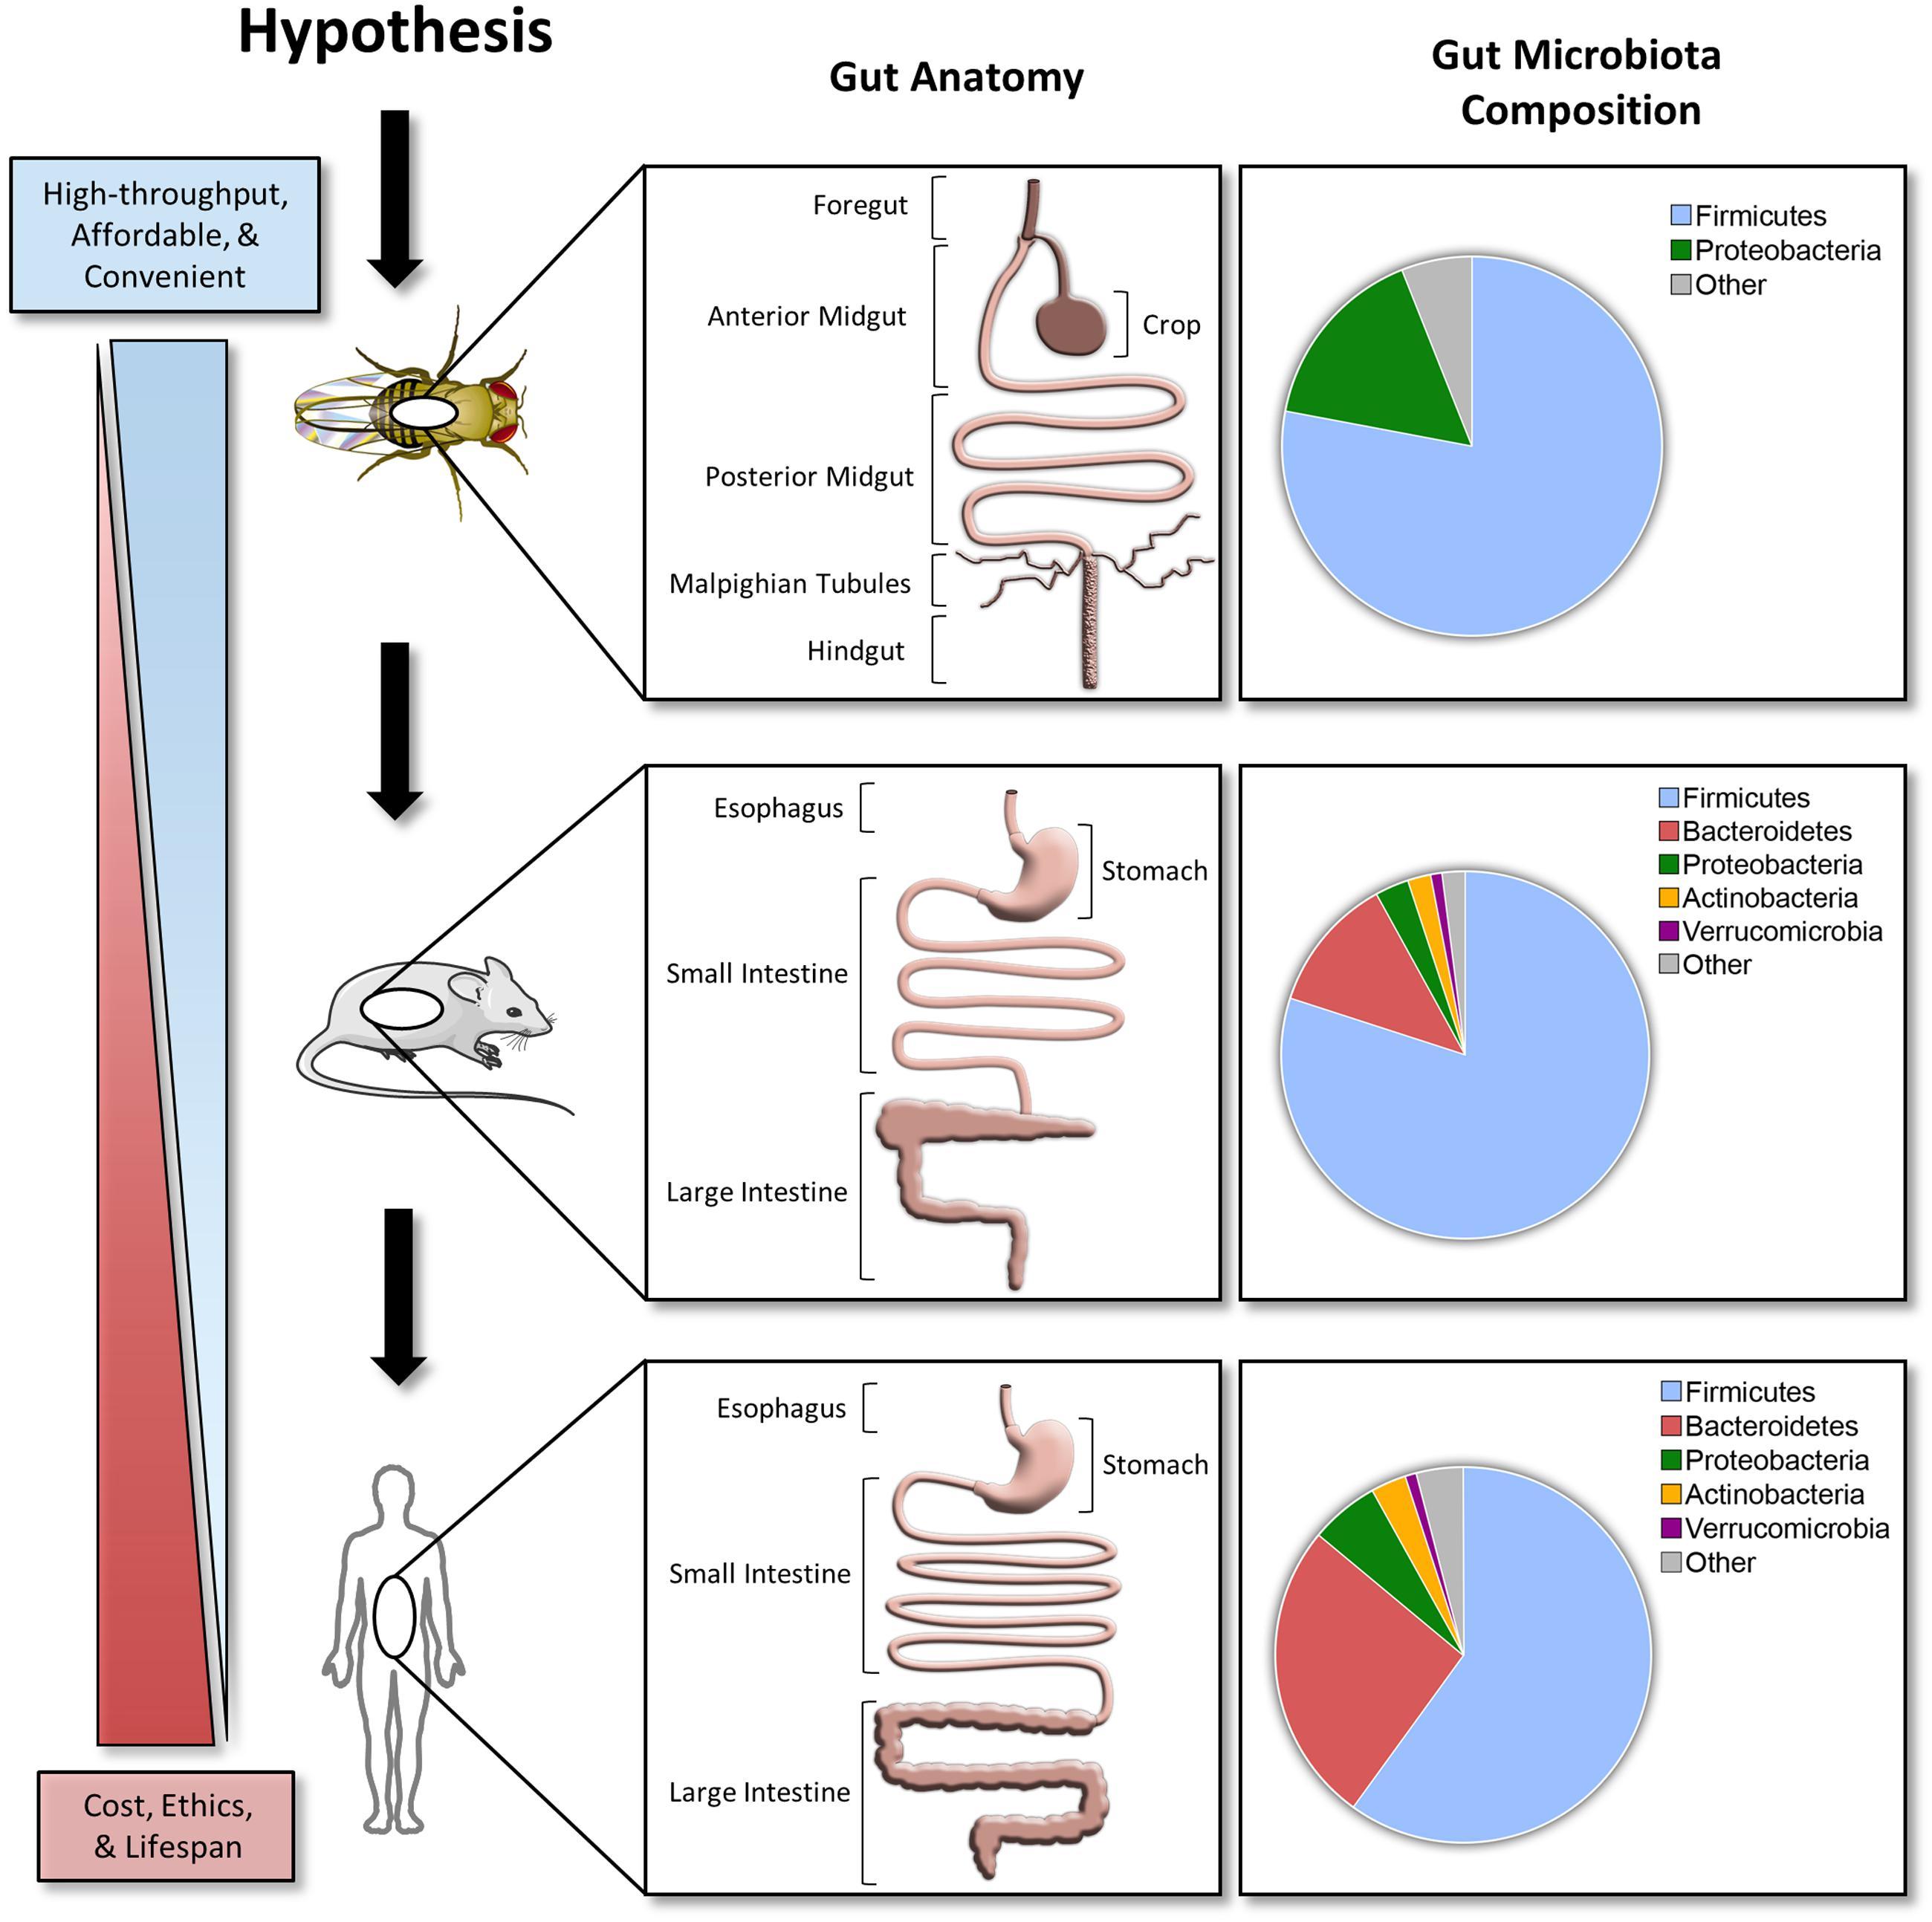 Frontiers | Drosophila melanogaster as a High-Throughput Model for ...